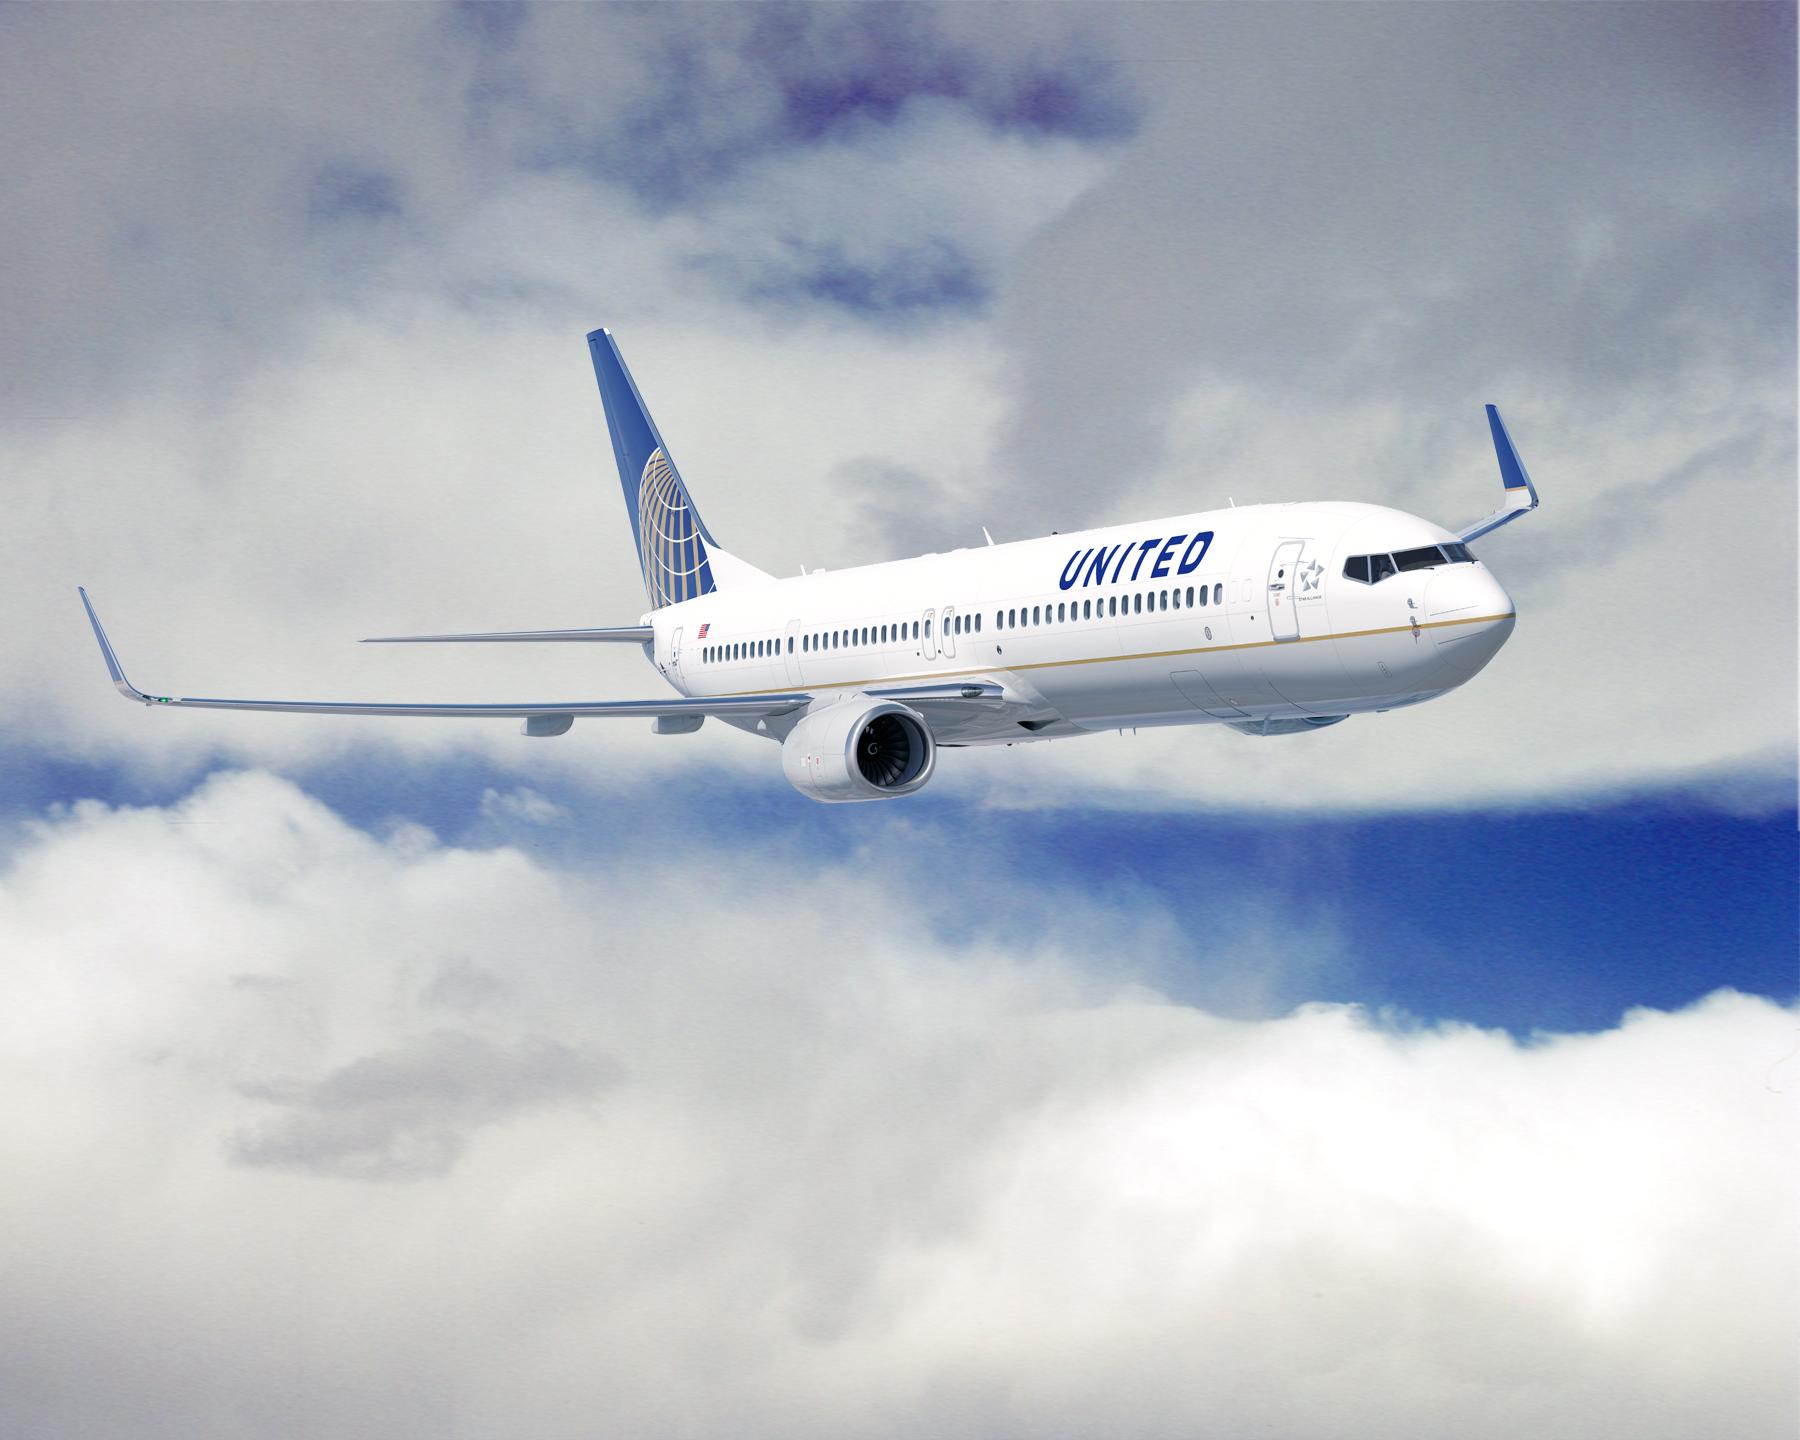 Avião United Airlines